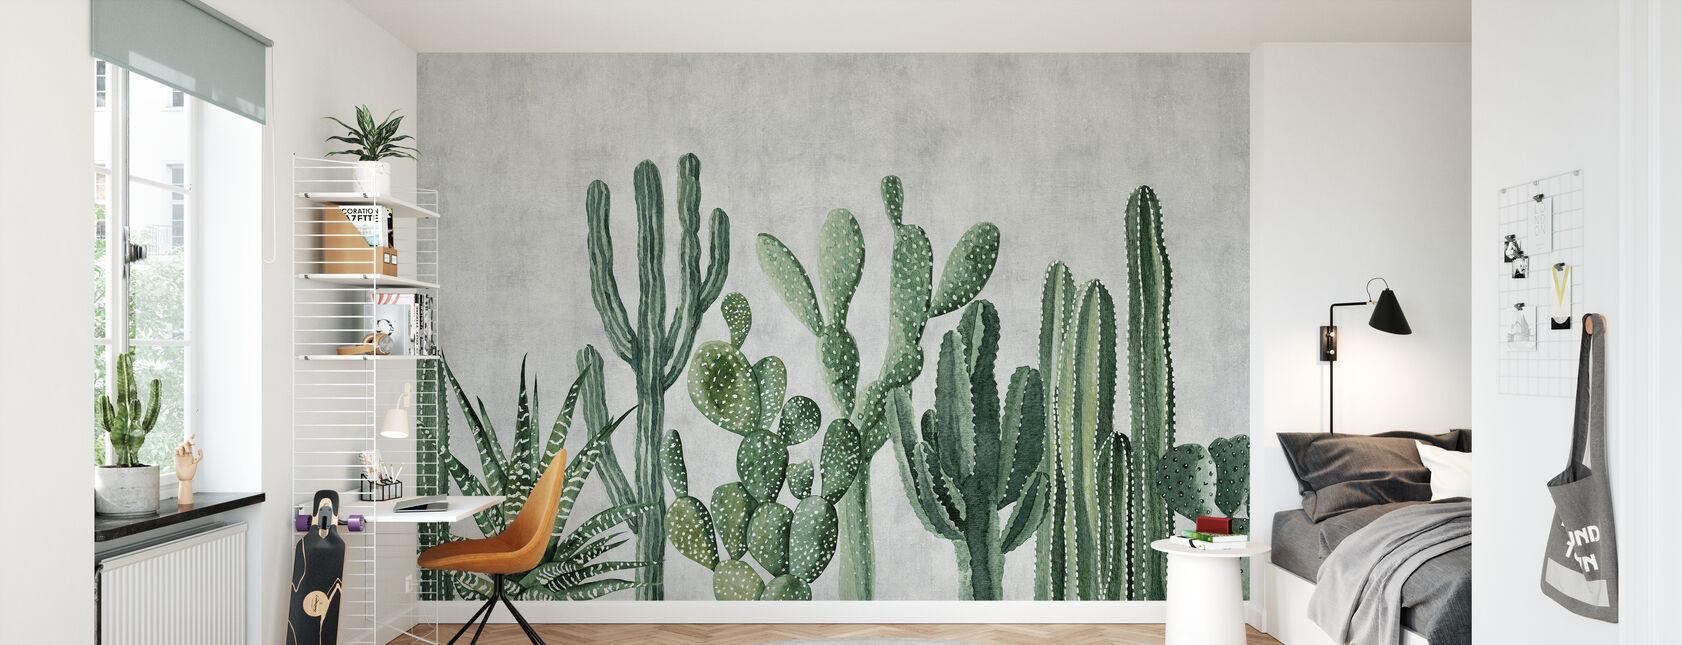 Atacama Kaktus - Tapete - Kinderzimmer